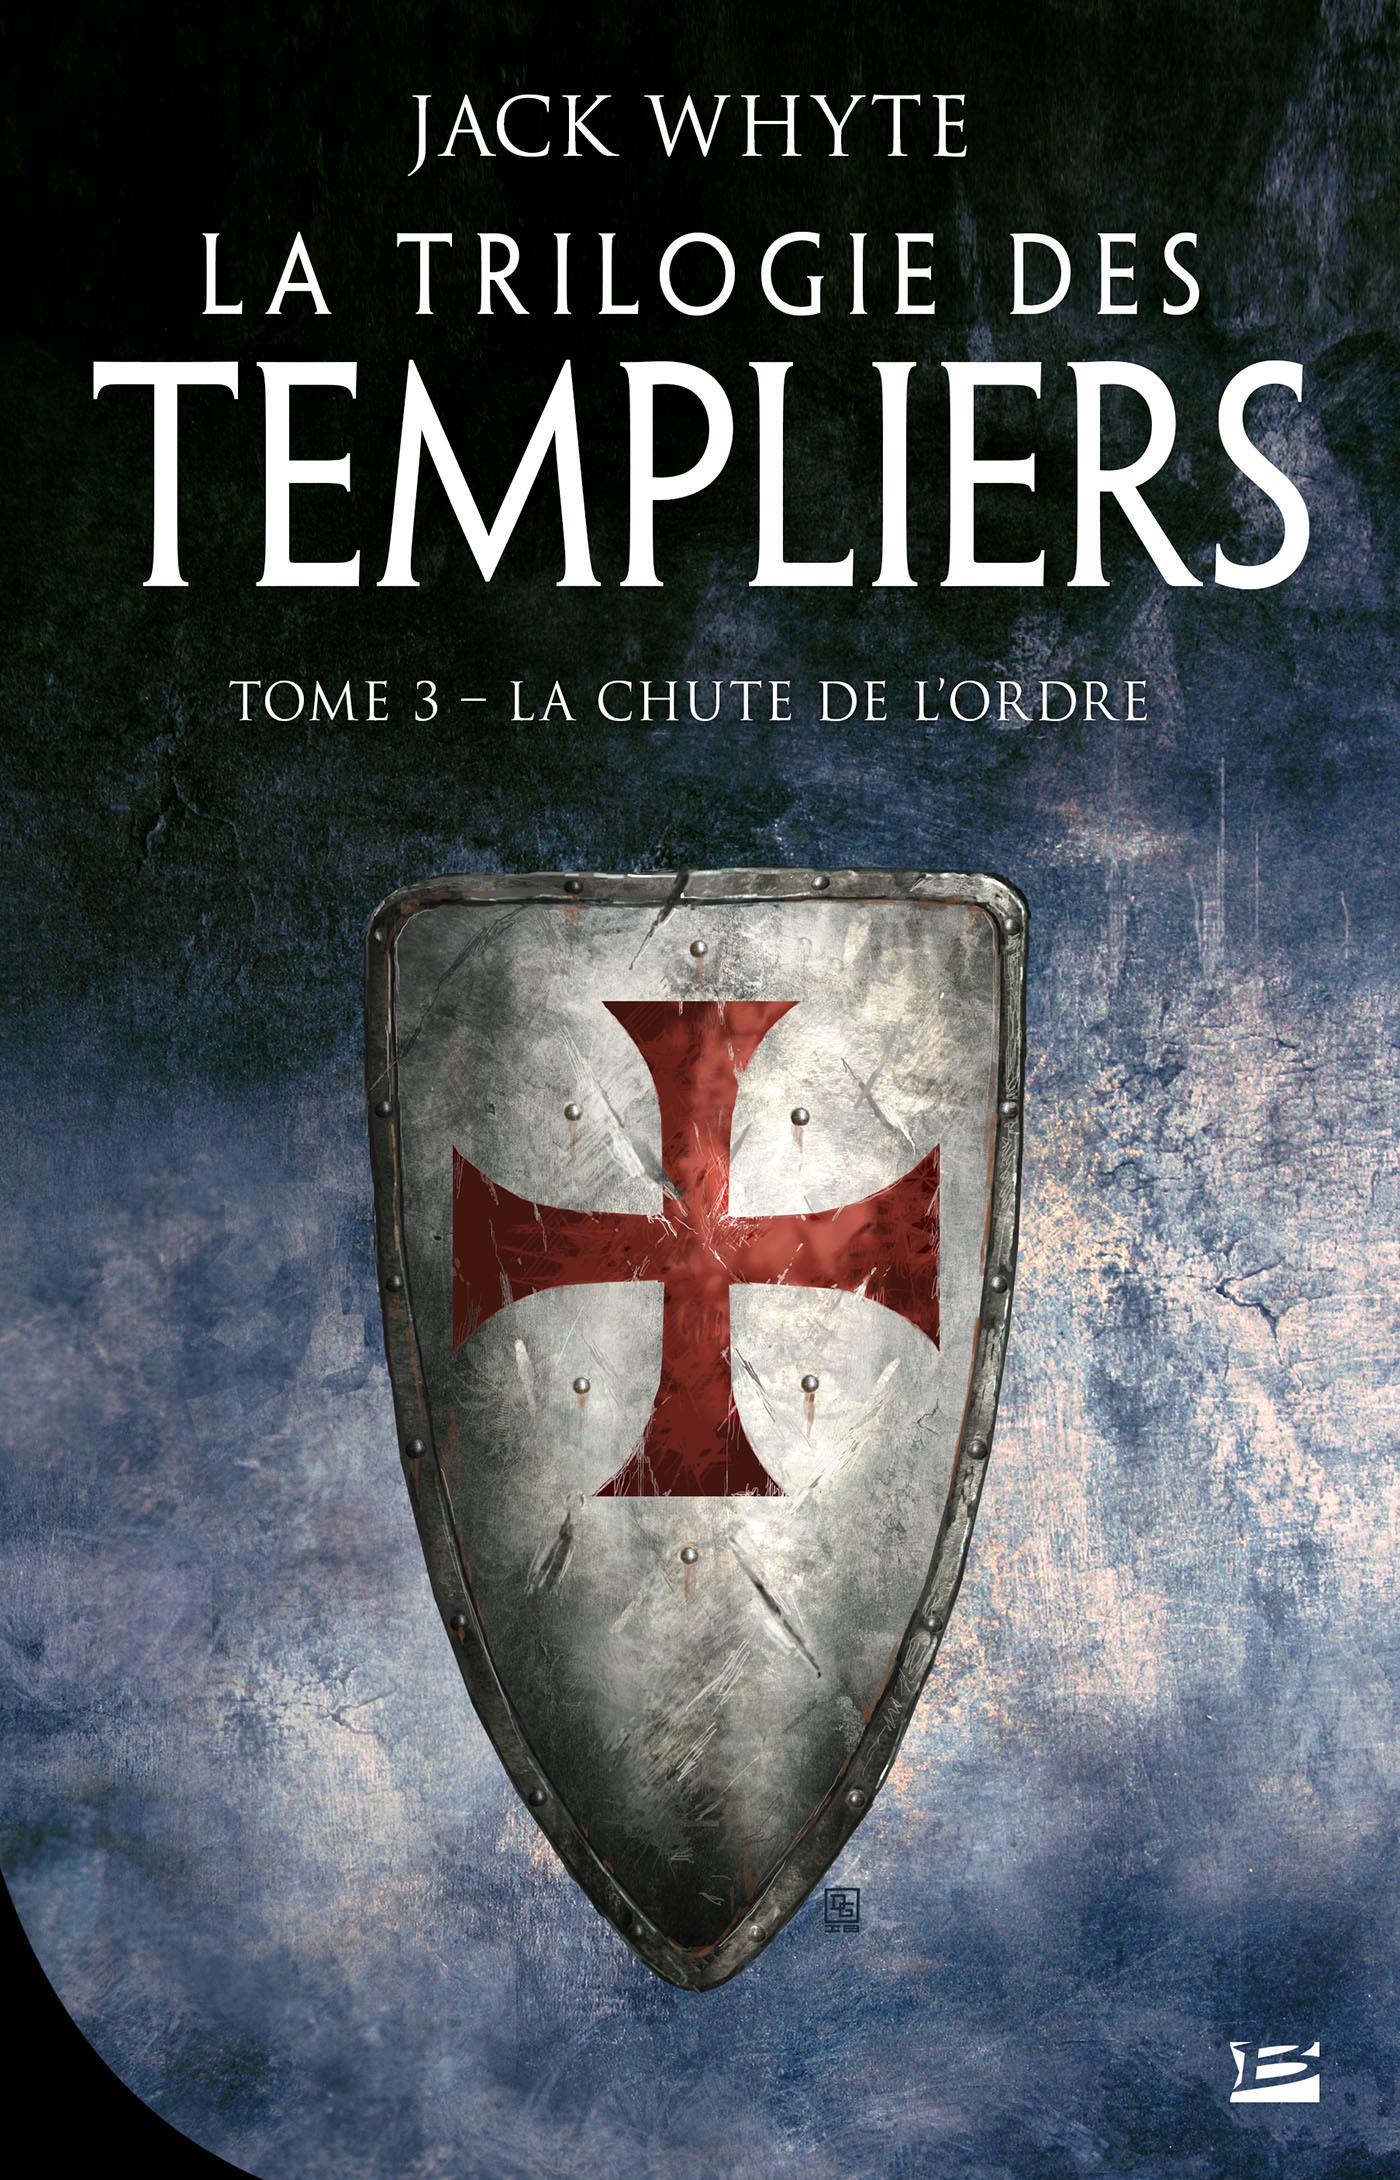 cdn1.booknode.com/book_cover/1141/full/la-trilogie-des-templiers-tome-3-la-chute-de-l-ordre-1140675.jpg